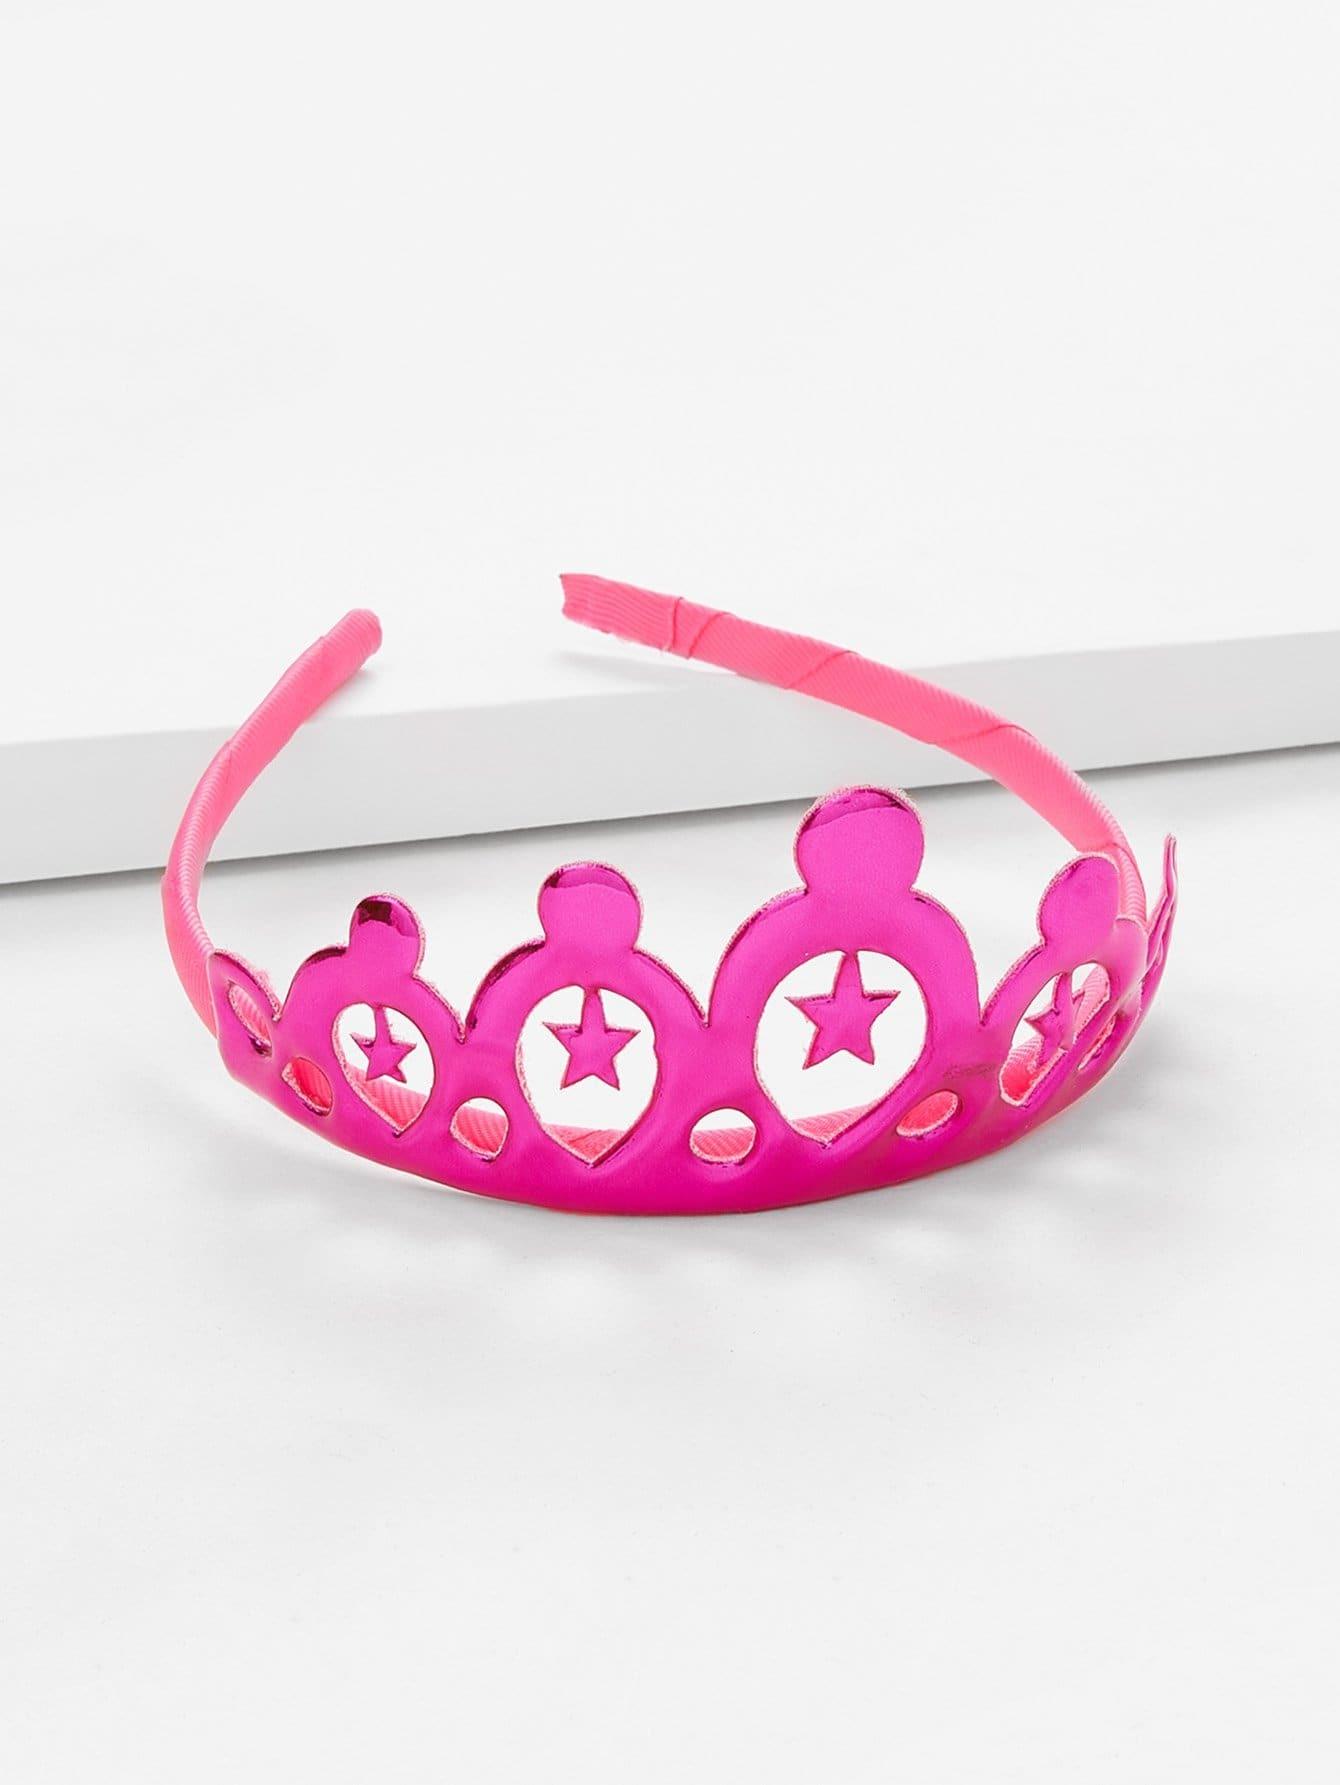 Crown Decorated Headband crown decorated headband